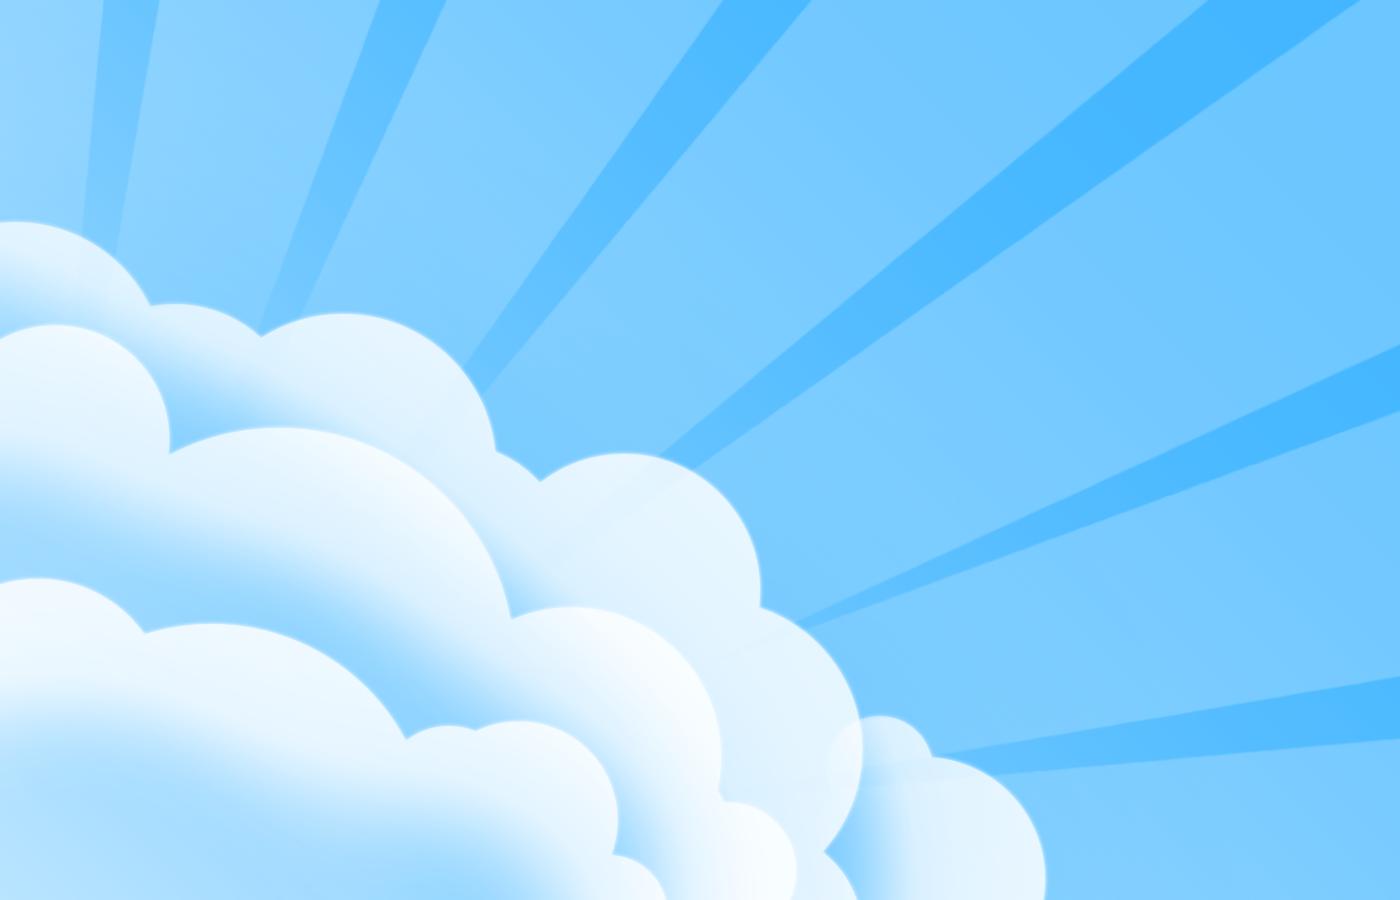 1400x900 6 Sky Vector Art Free Downloads Images